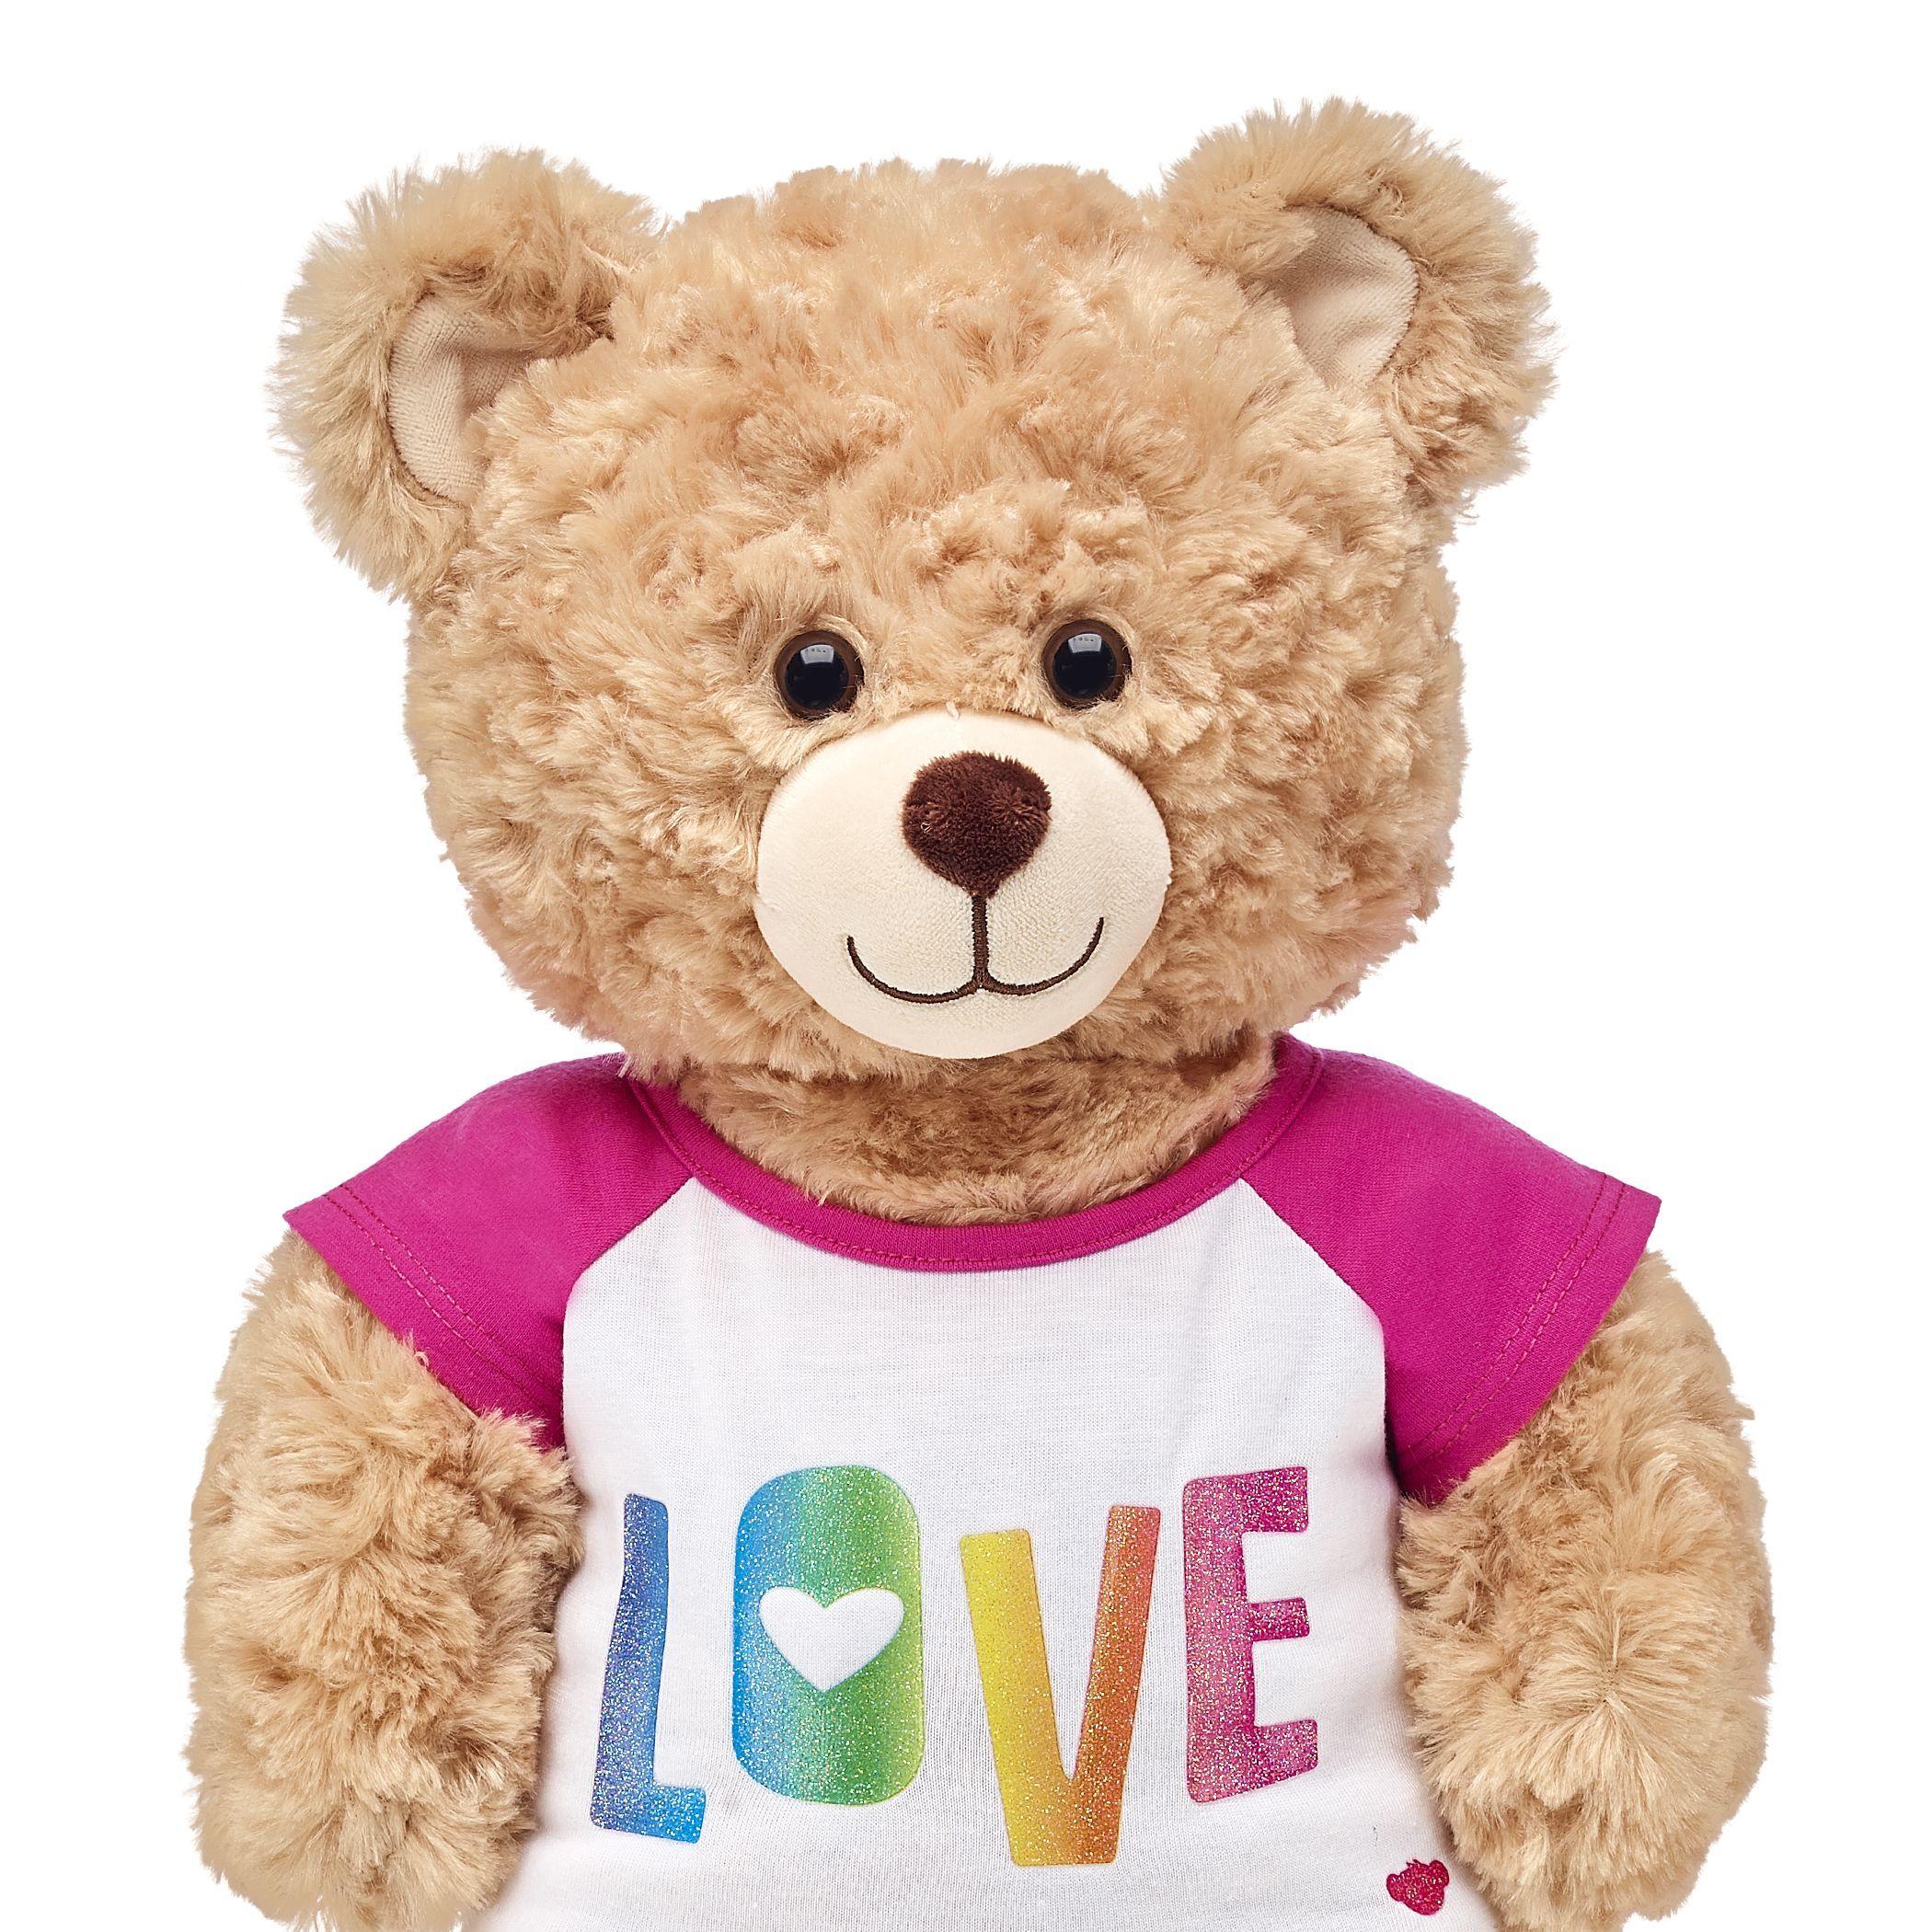 Stuffed Animal Bear Doll T-shirt  Assorted Colors NEW